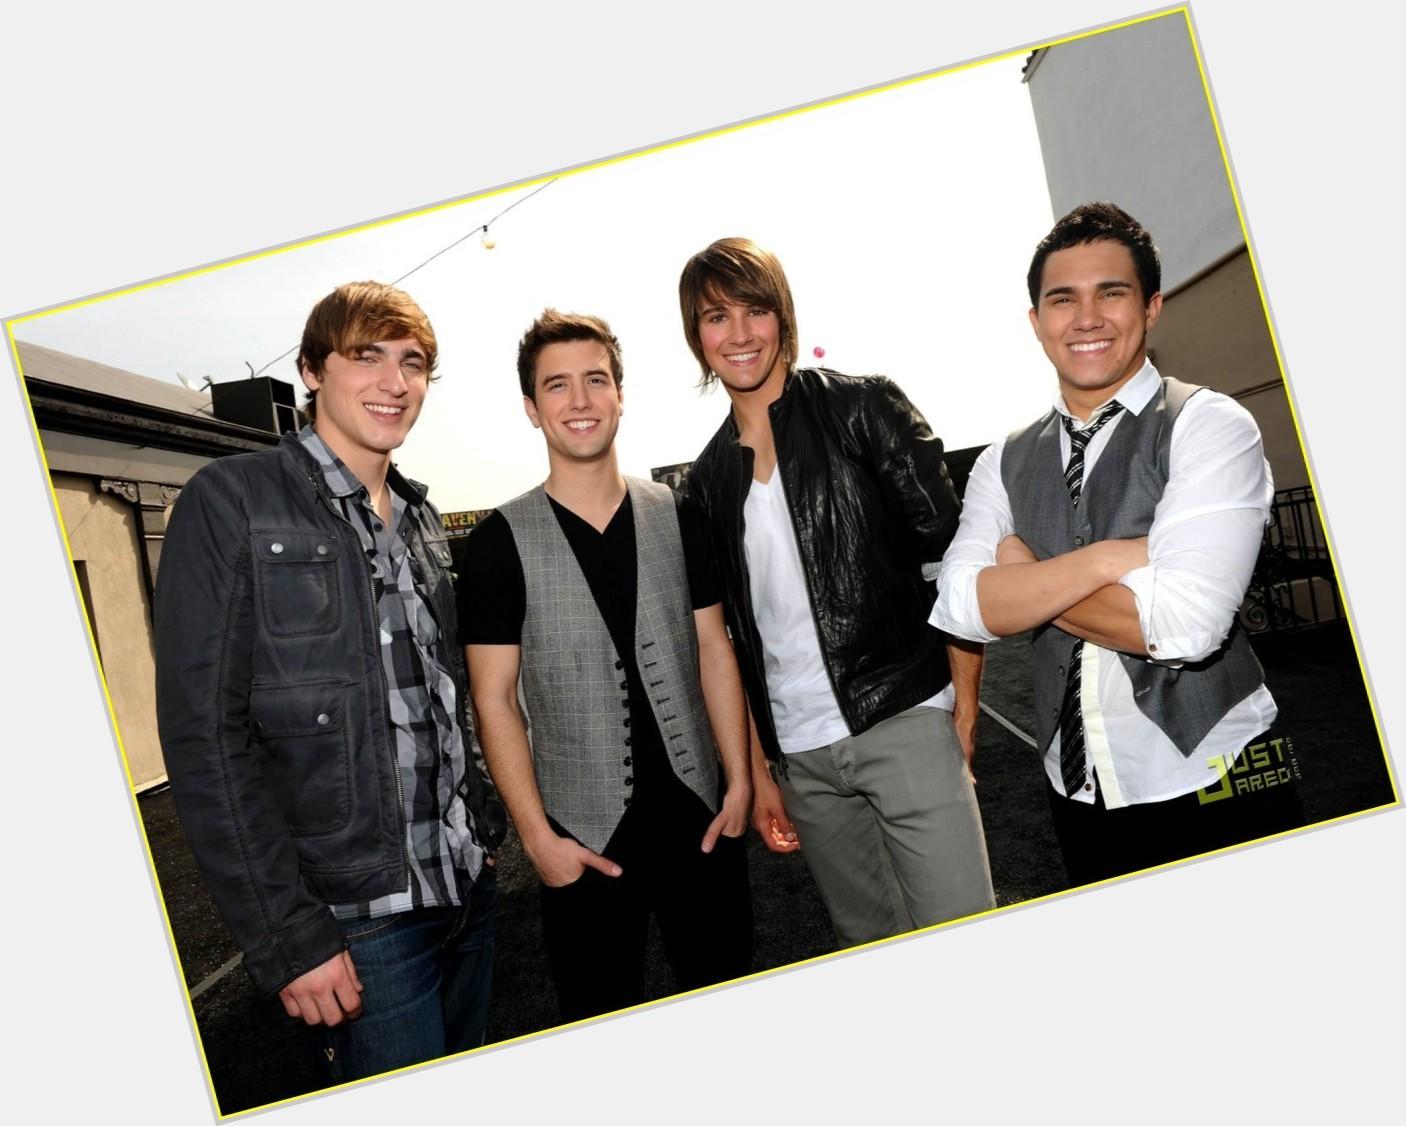 Big Time Rush & My Life: BTR Trivia - rusherblog.blogspot.com